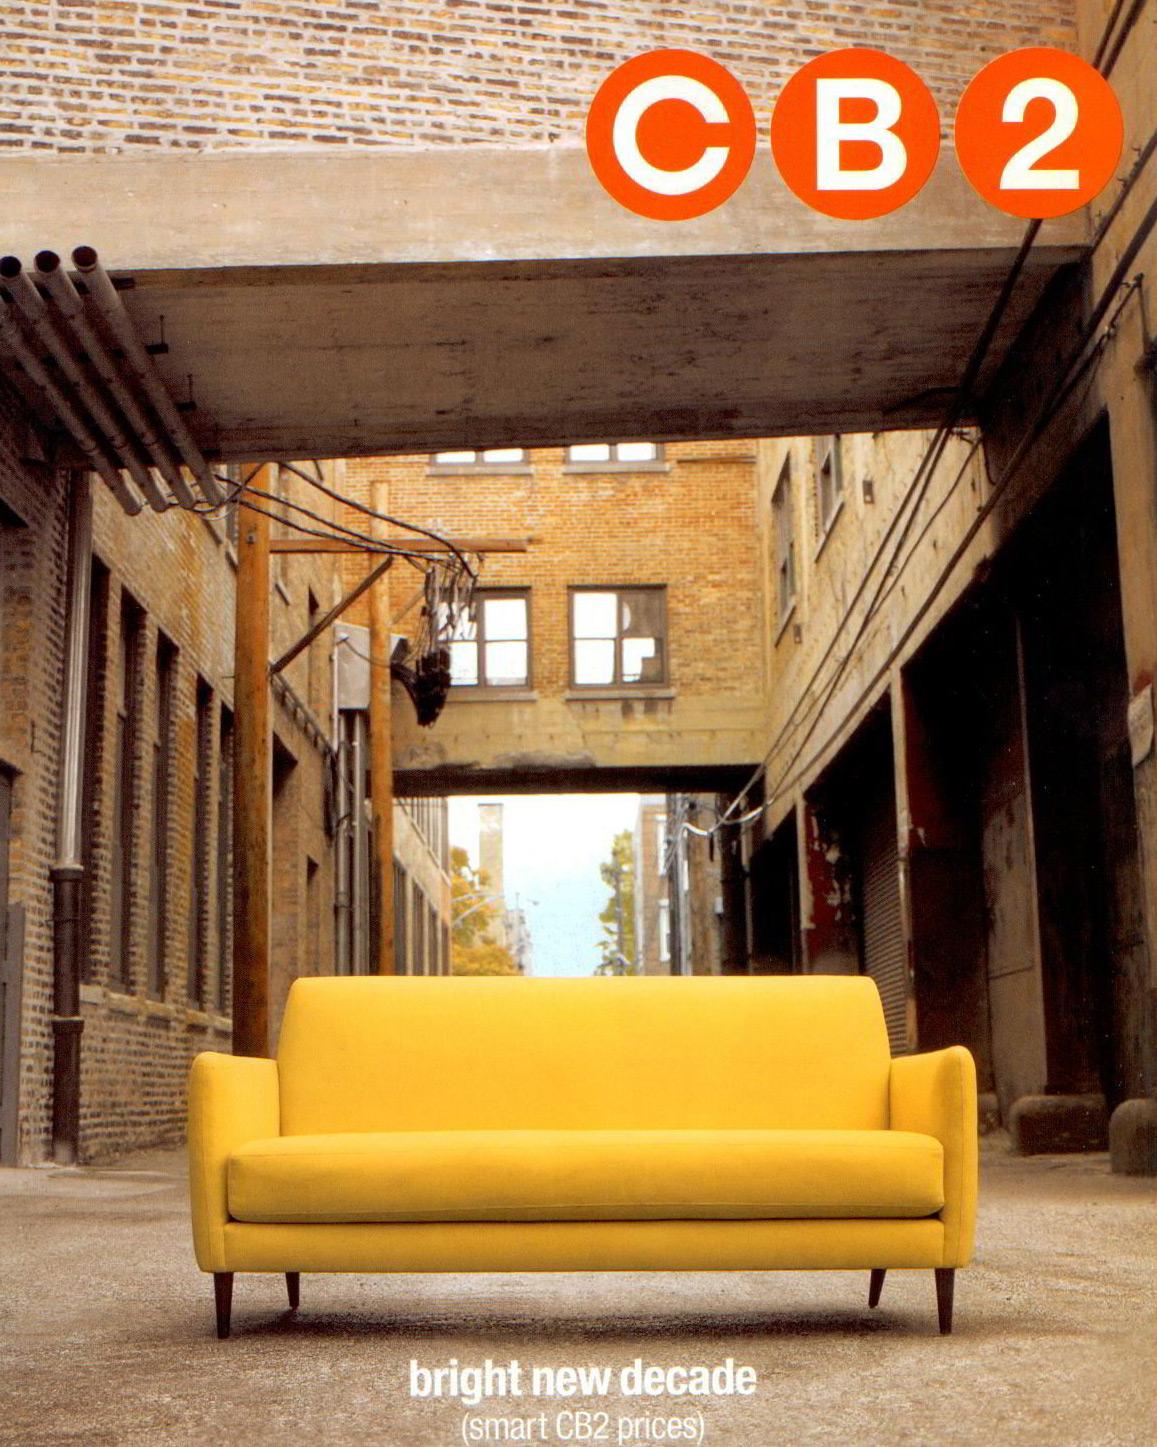 CB2_cover_spring_yellow_sofa.jpg